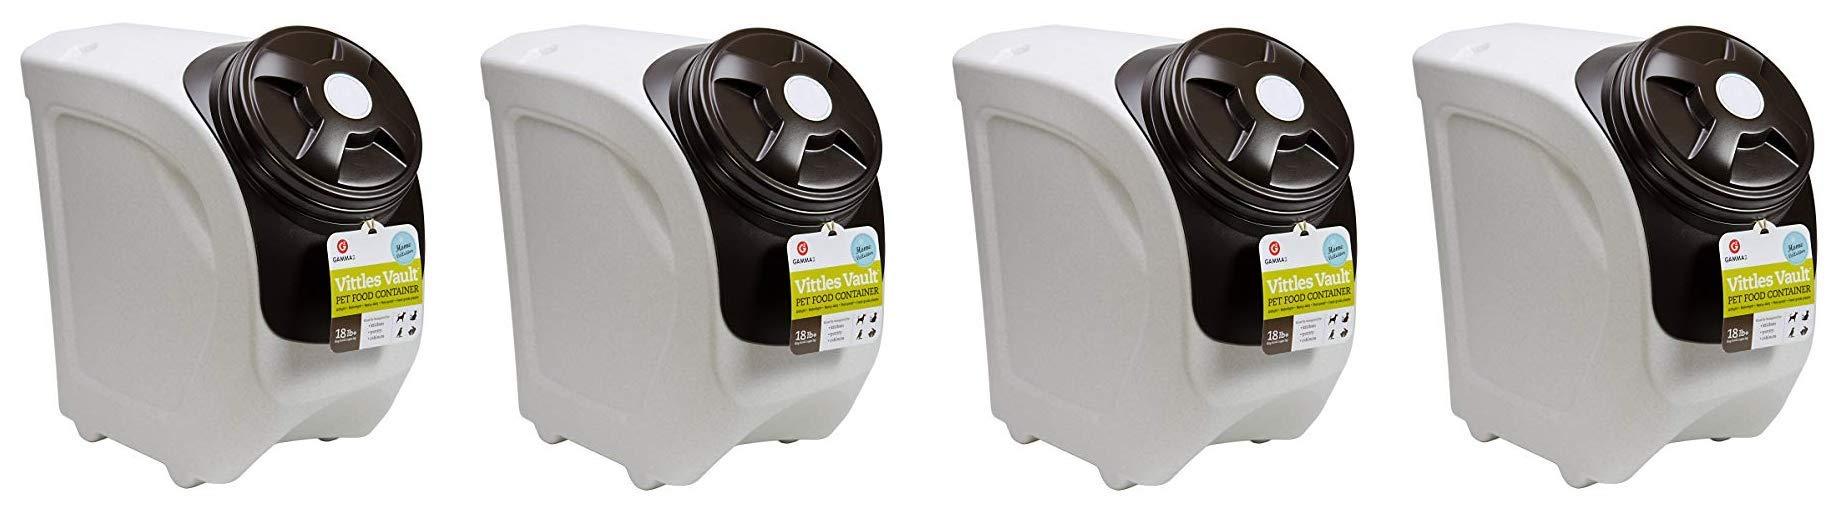 Vittles Vault 4318 Home Stackable Airtight Pet Food Storage Container, 18 lb, Mocha Granite (Fоur Расk)